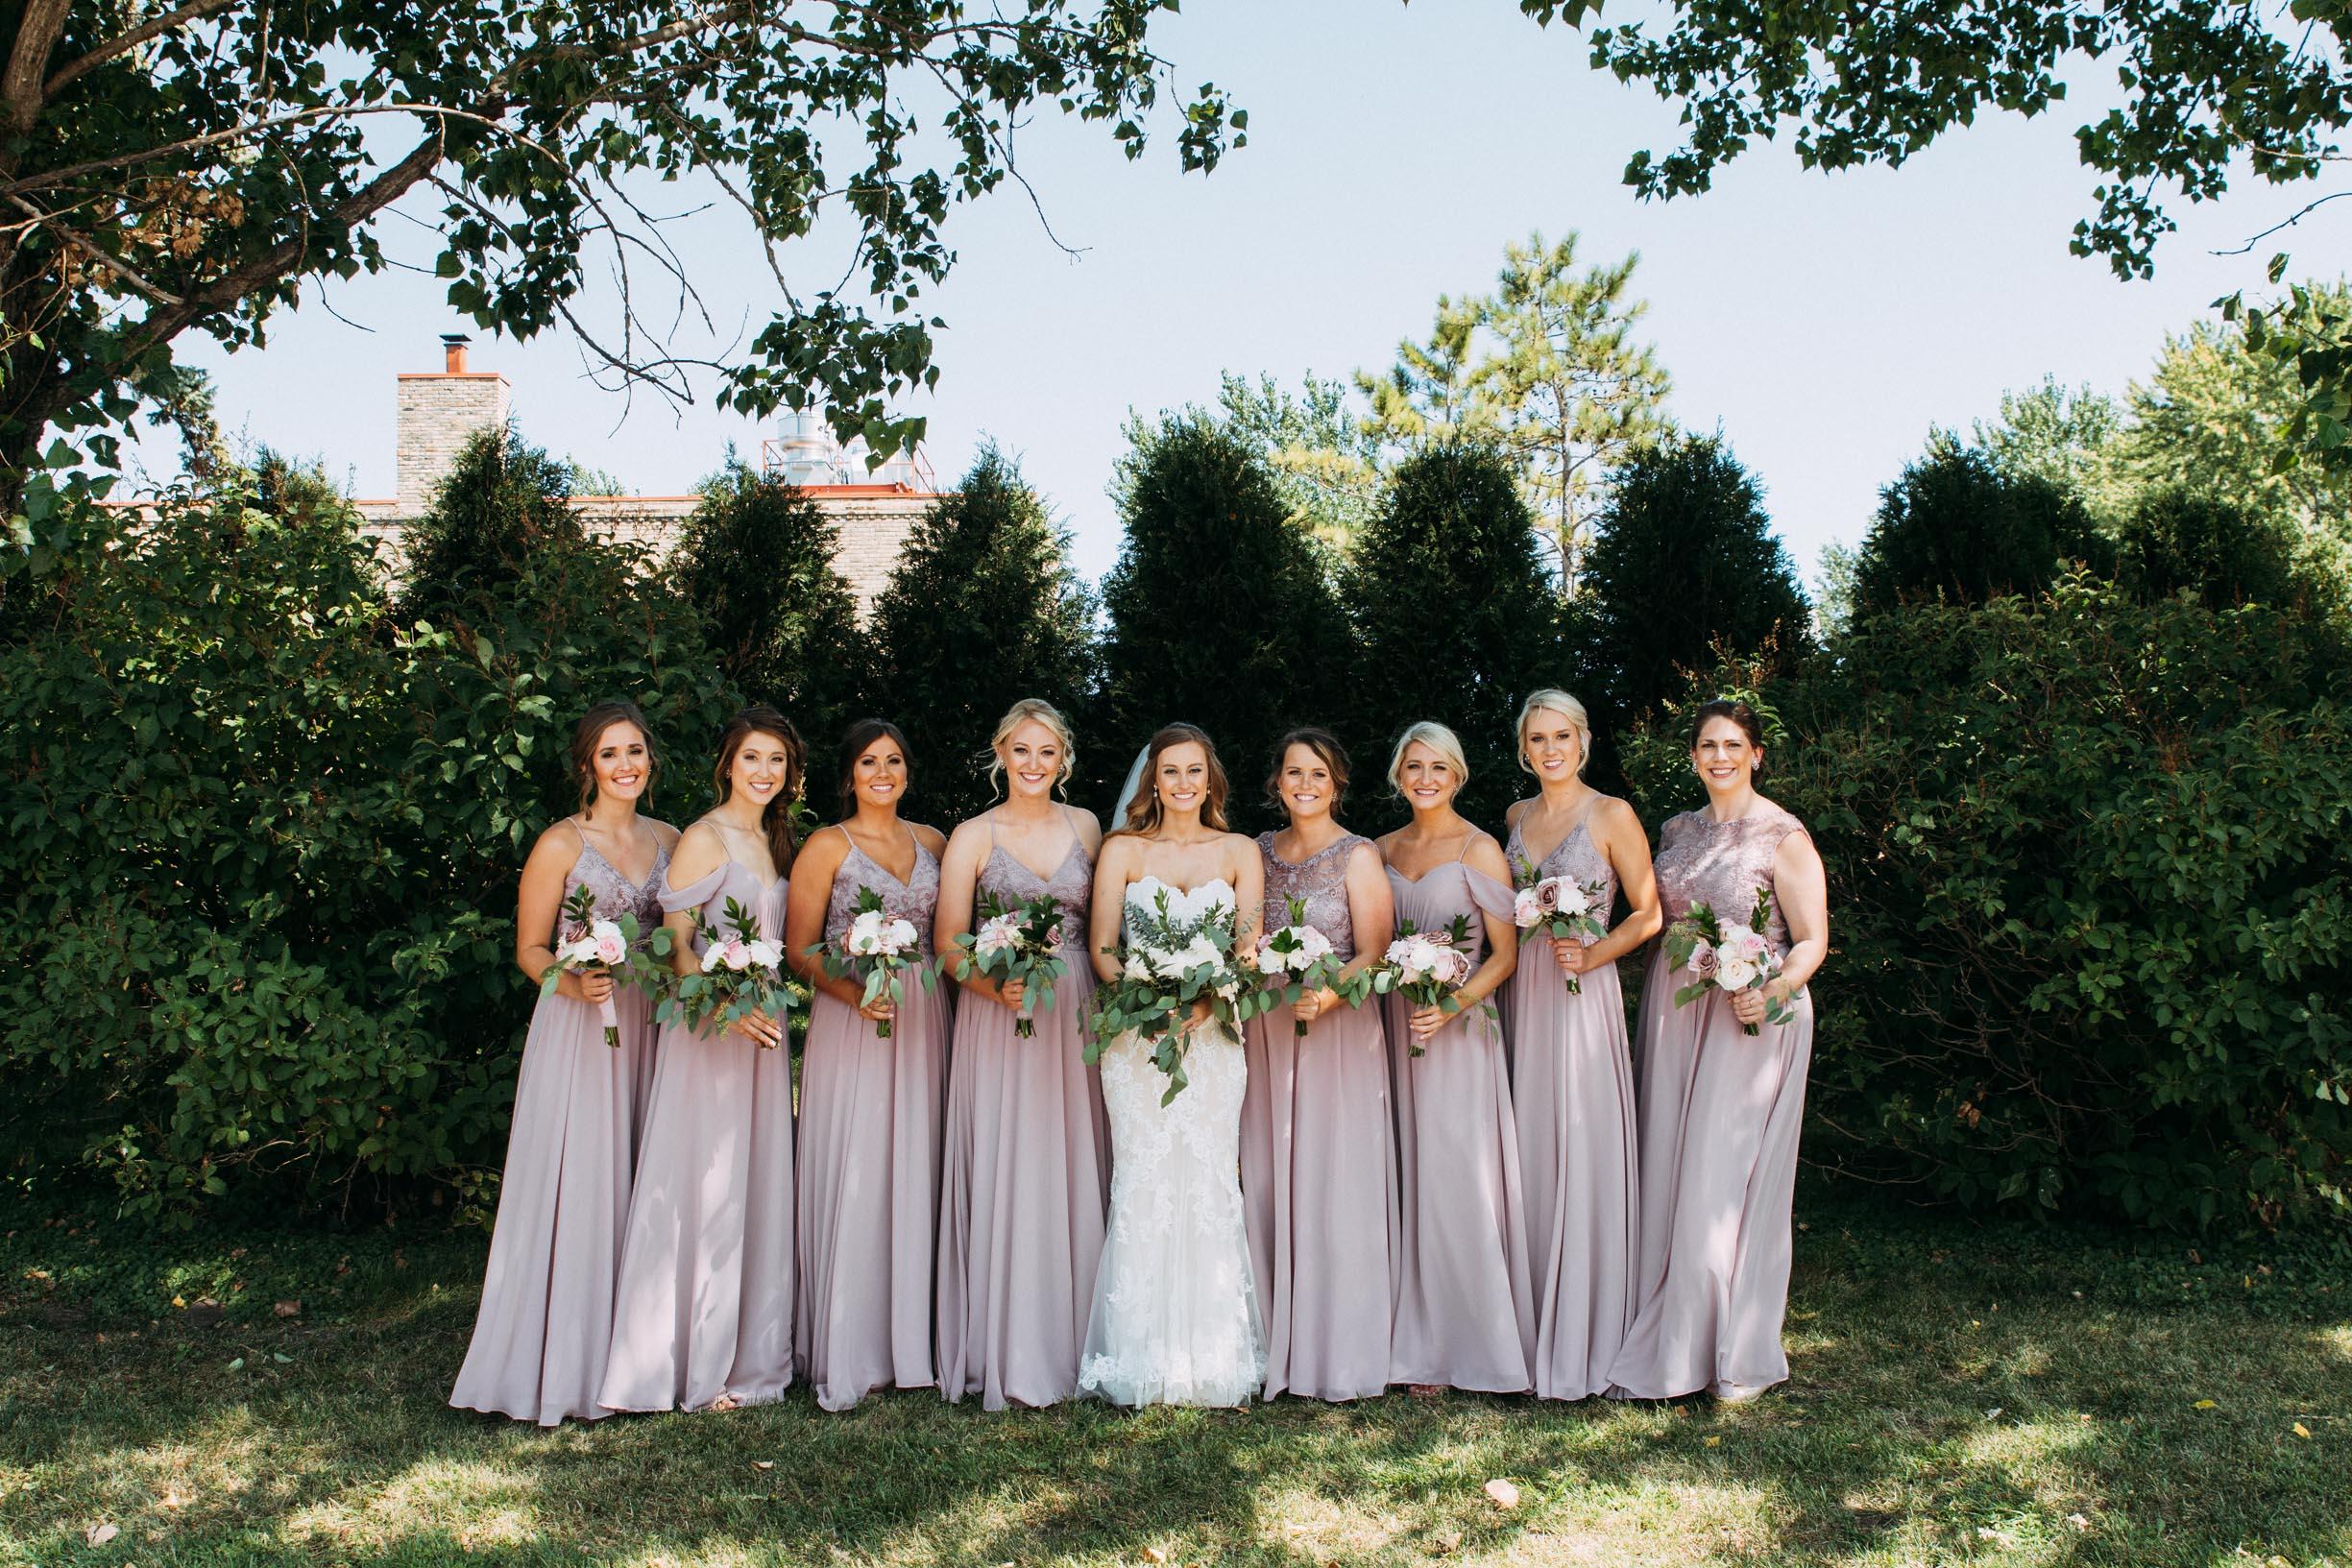 31-WeddingsattheBroz_Minnesota_WeddingBlog_WeddingParty.jpg